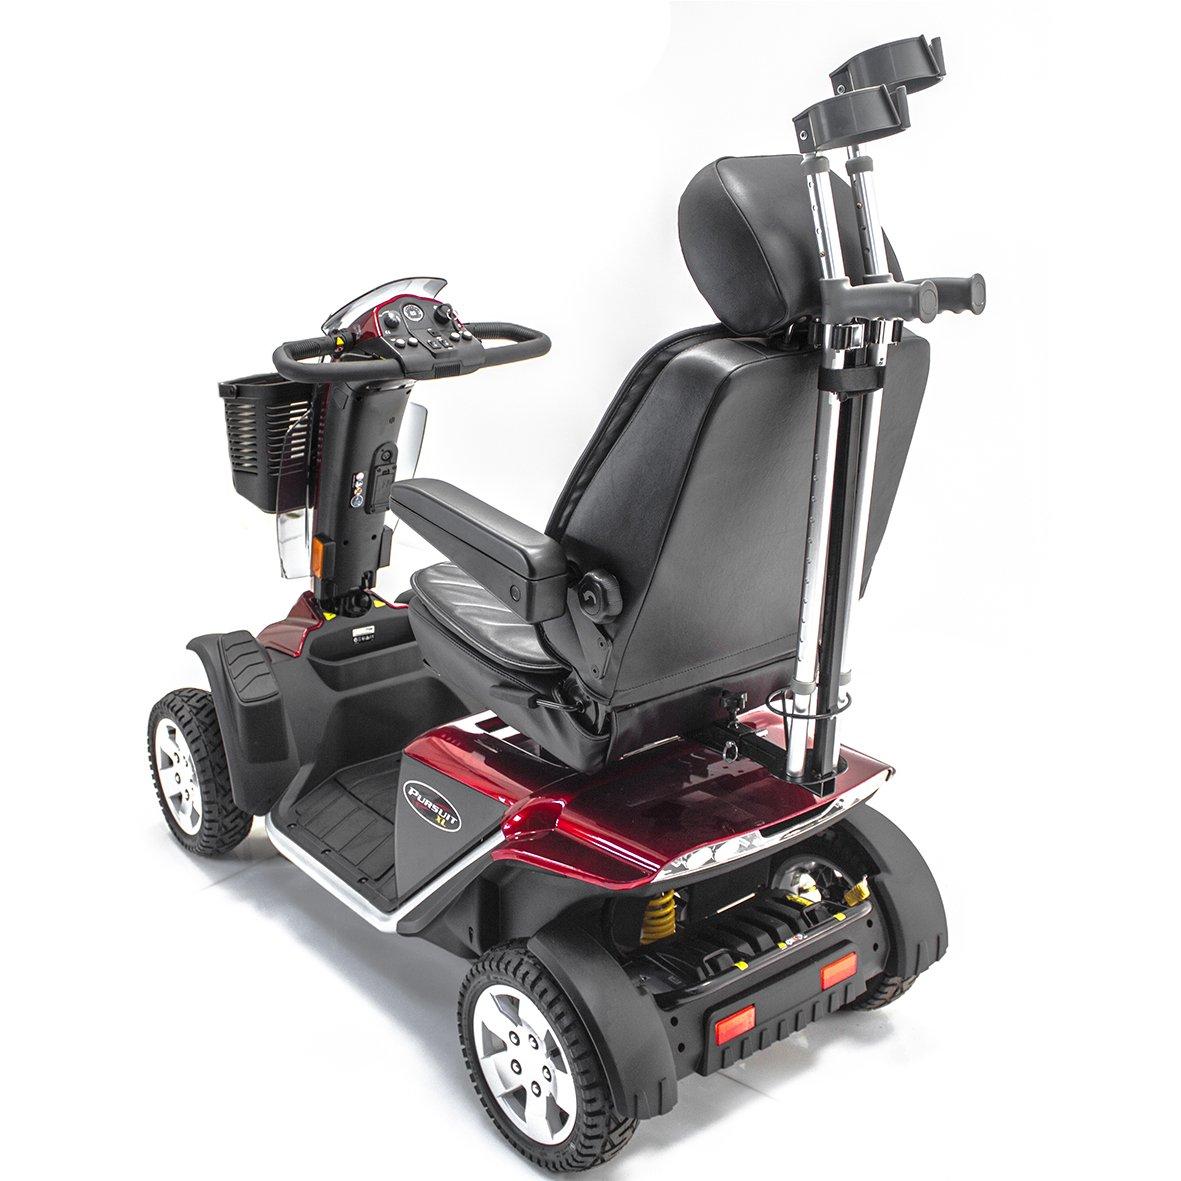 CRUTCH HOLDER for Most Pride Mobility, Go-Go, Drive, Golden, Challenger Scooter JCRH